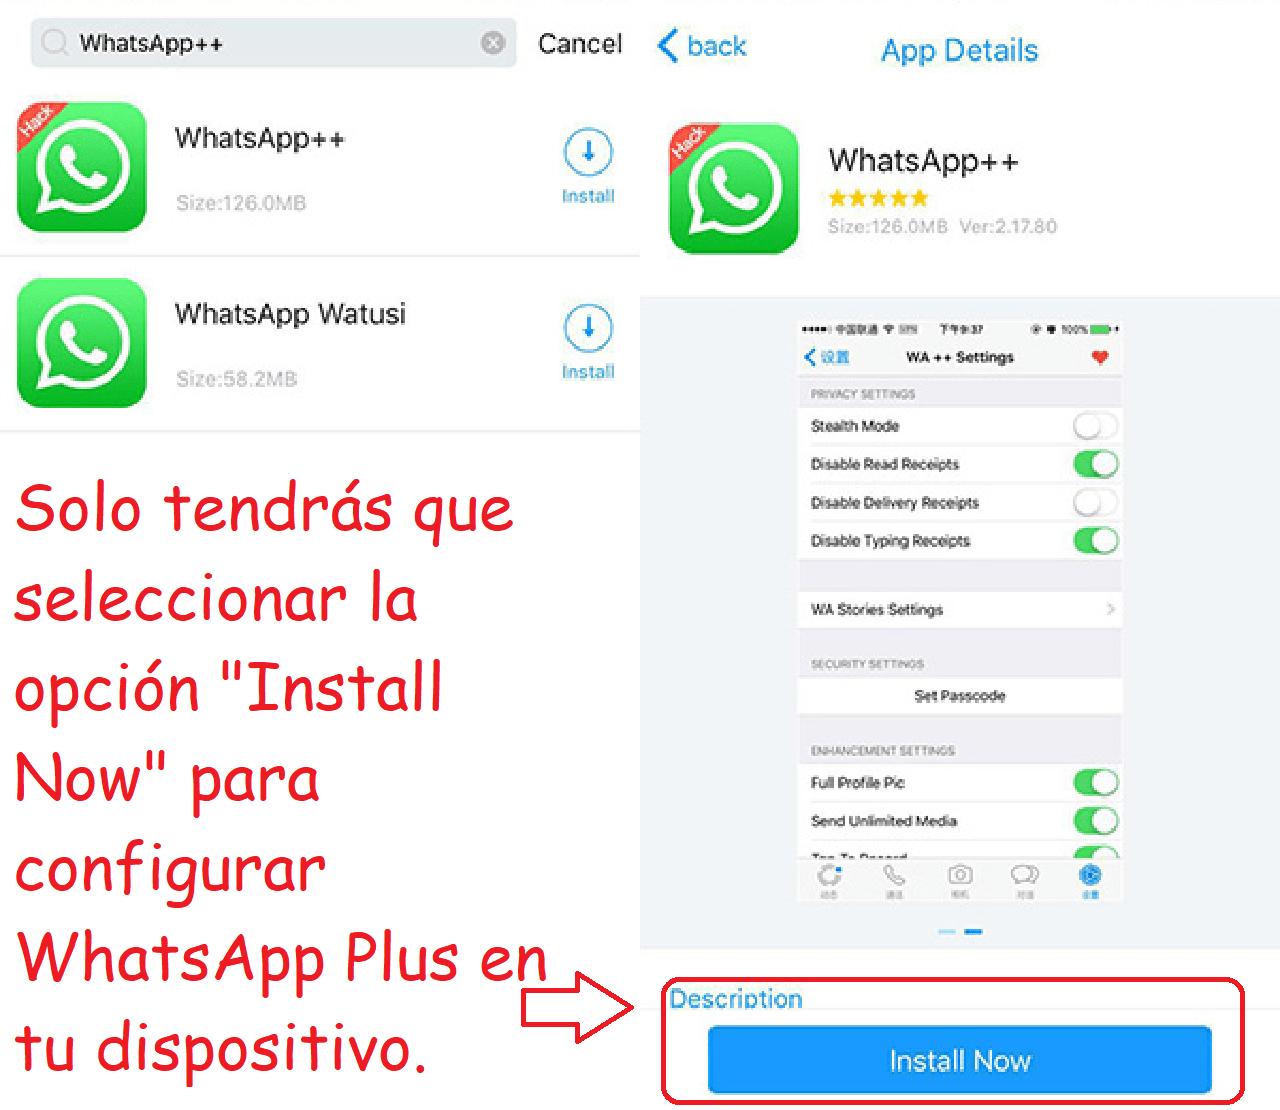 whatsapp plus appvalley instalar aplicación